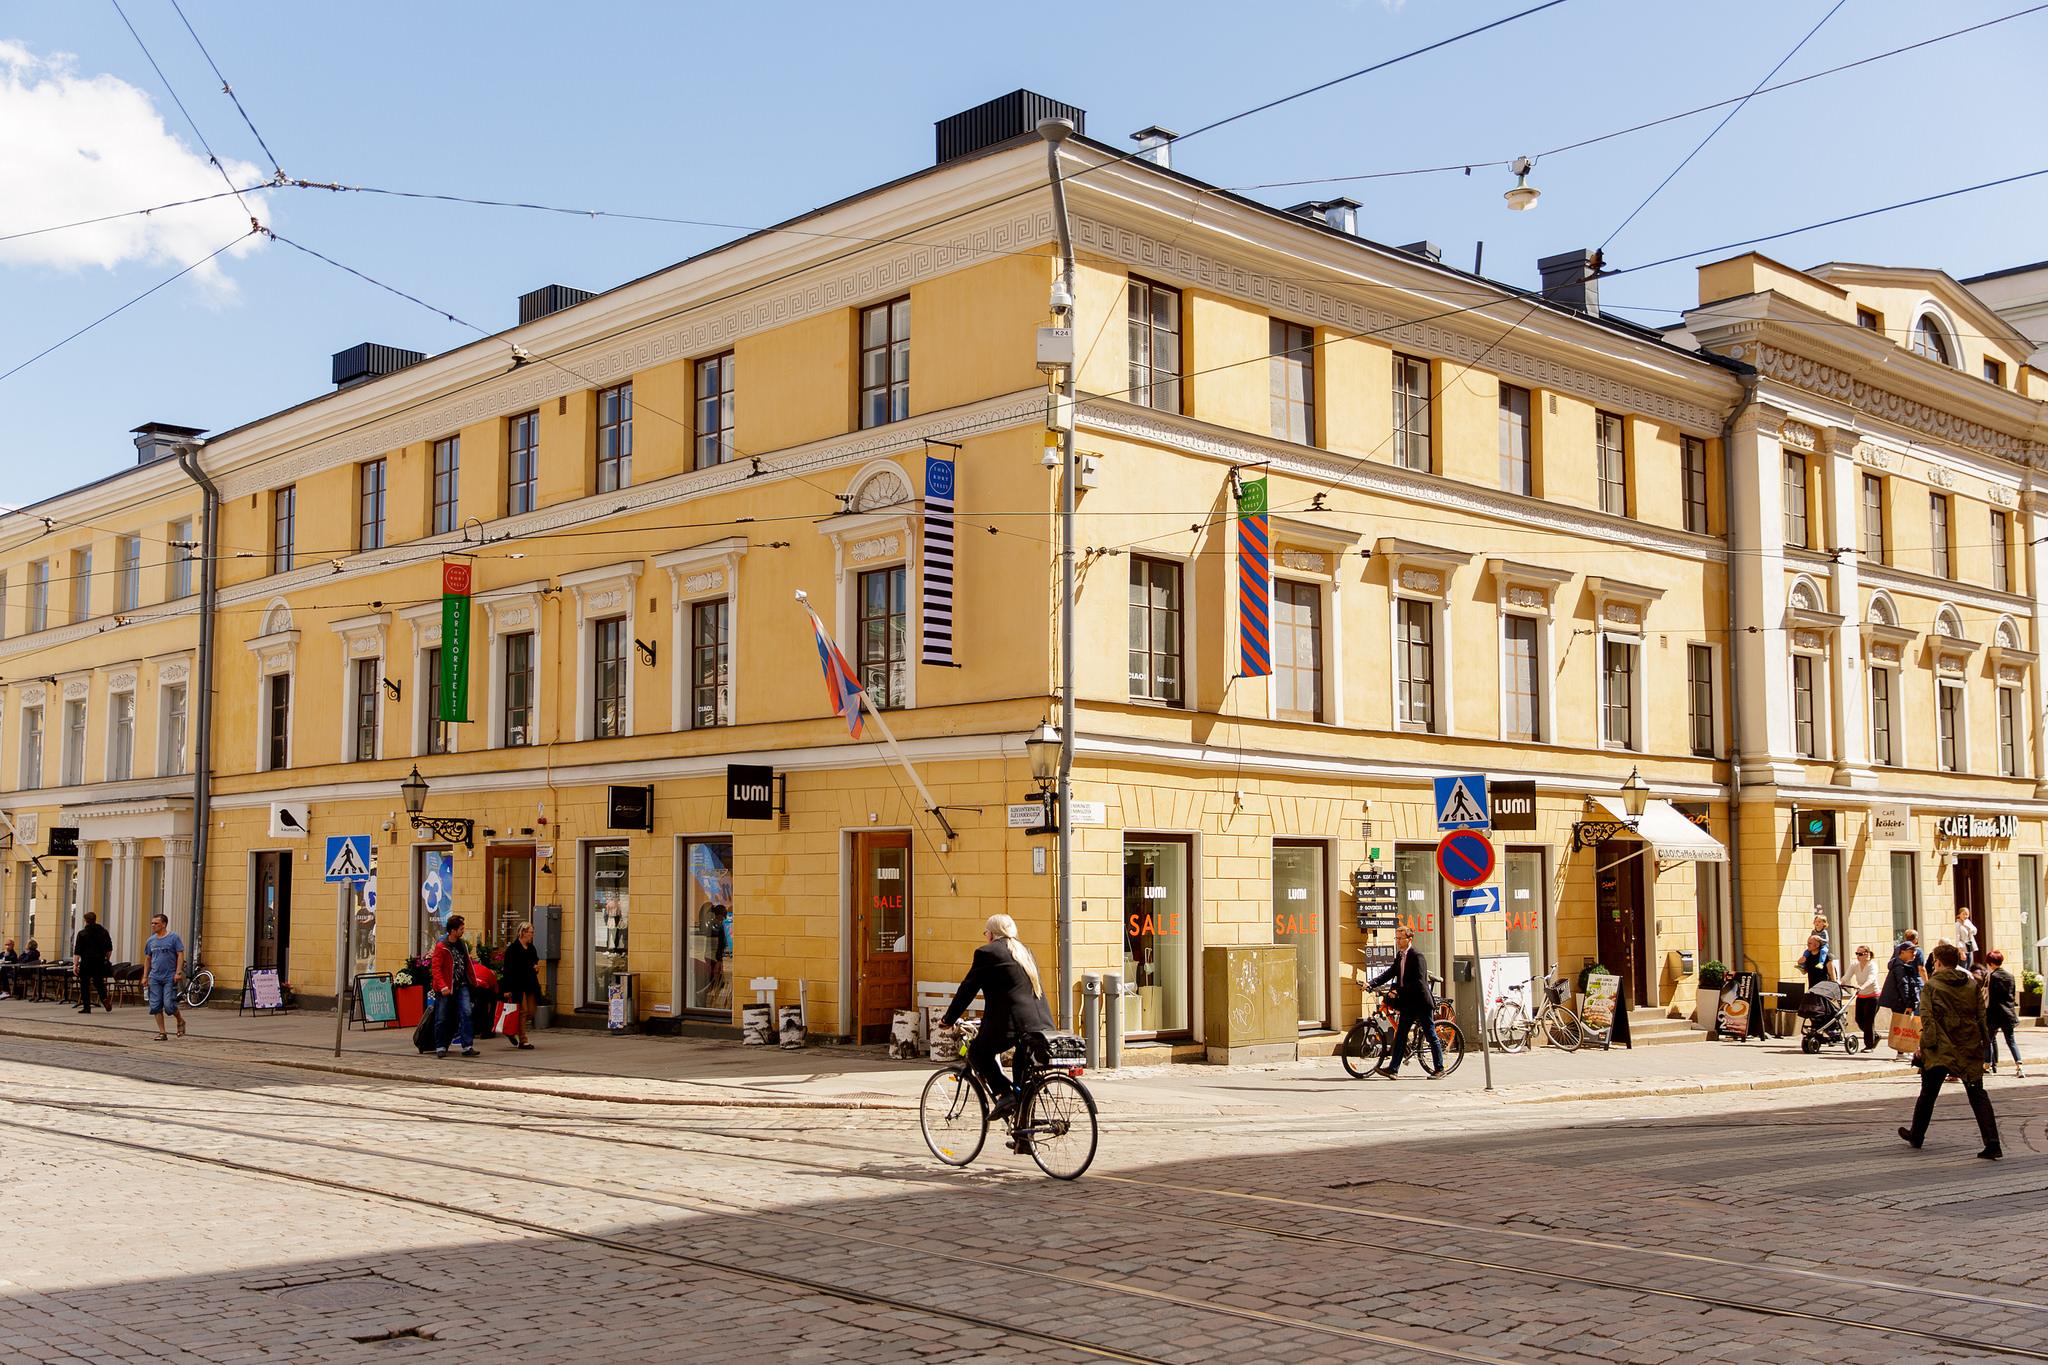 Toimitila, Aleksanterinkatu 28, Keskusta, Helsinki